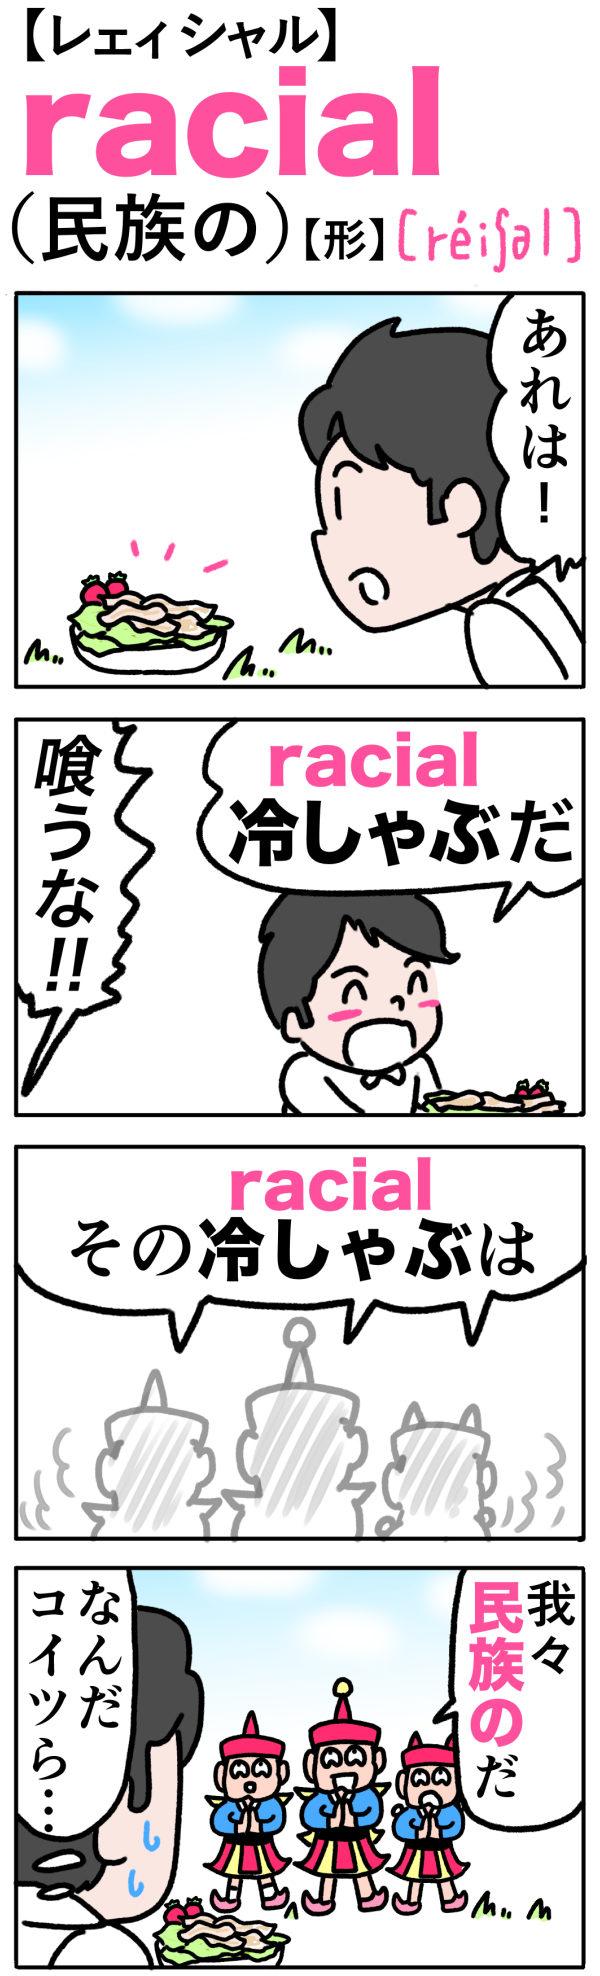 racial(民族の)の語呂合わせ英単語